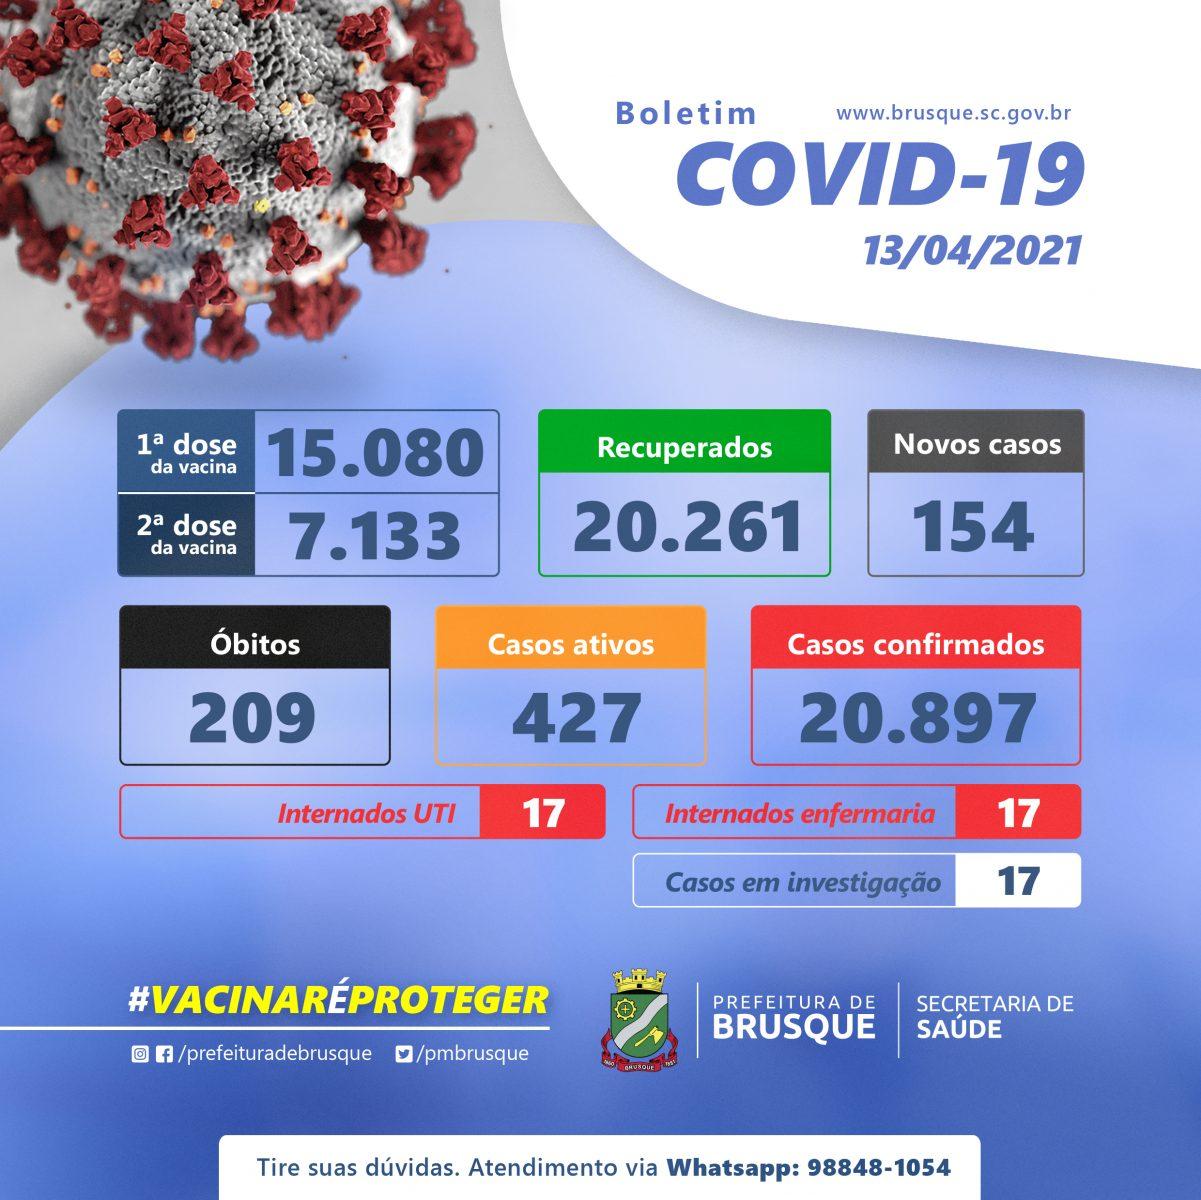 Covid 19: Confira o boletim epidemiológico desta terça-feira (13)